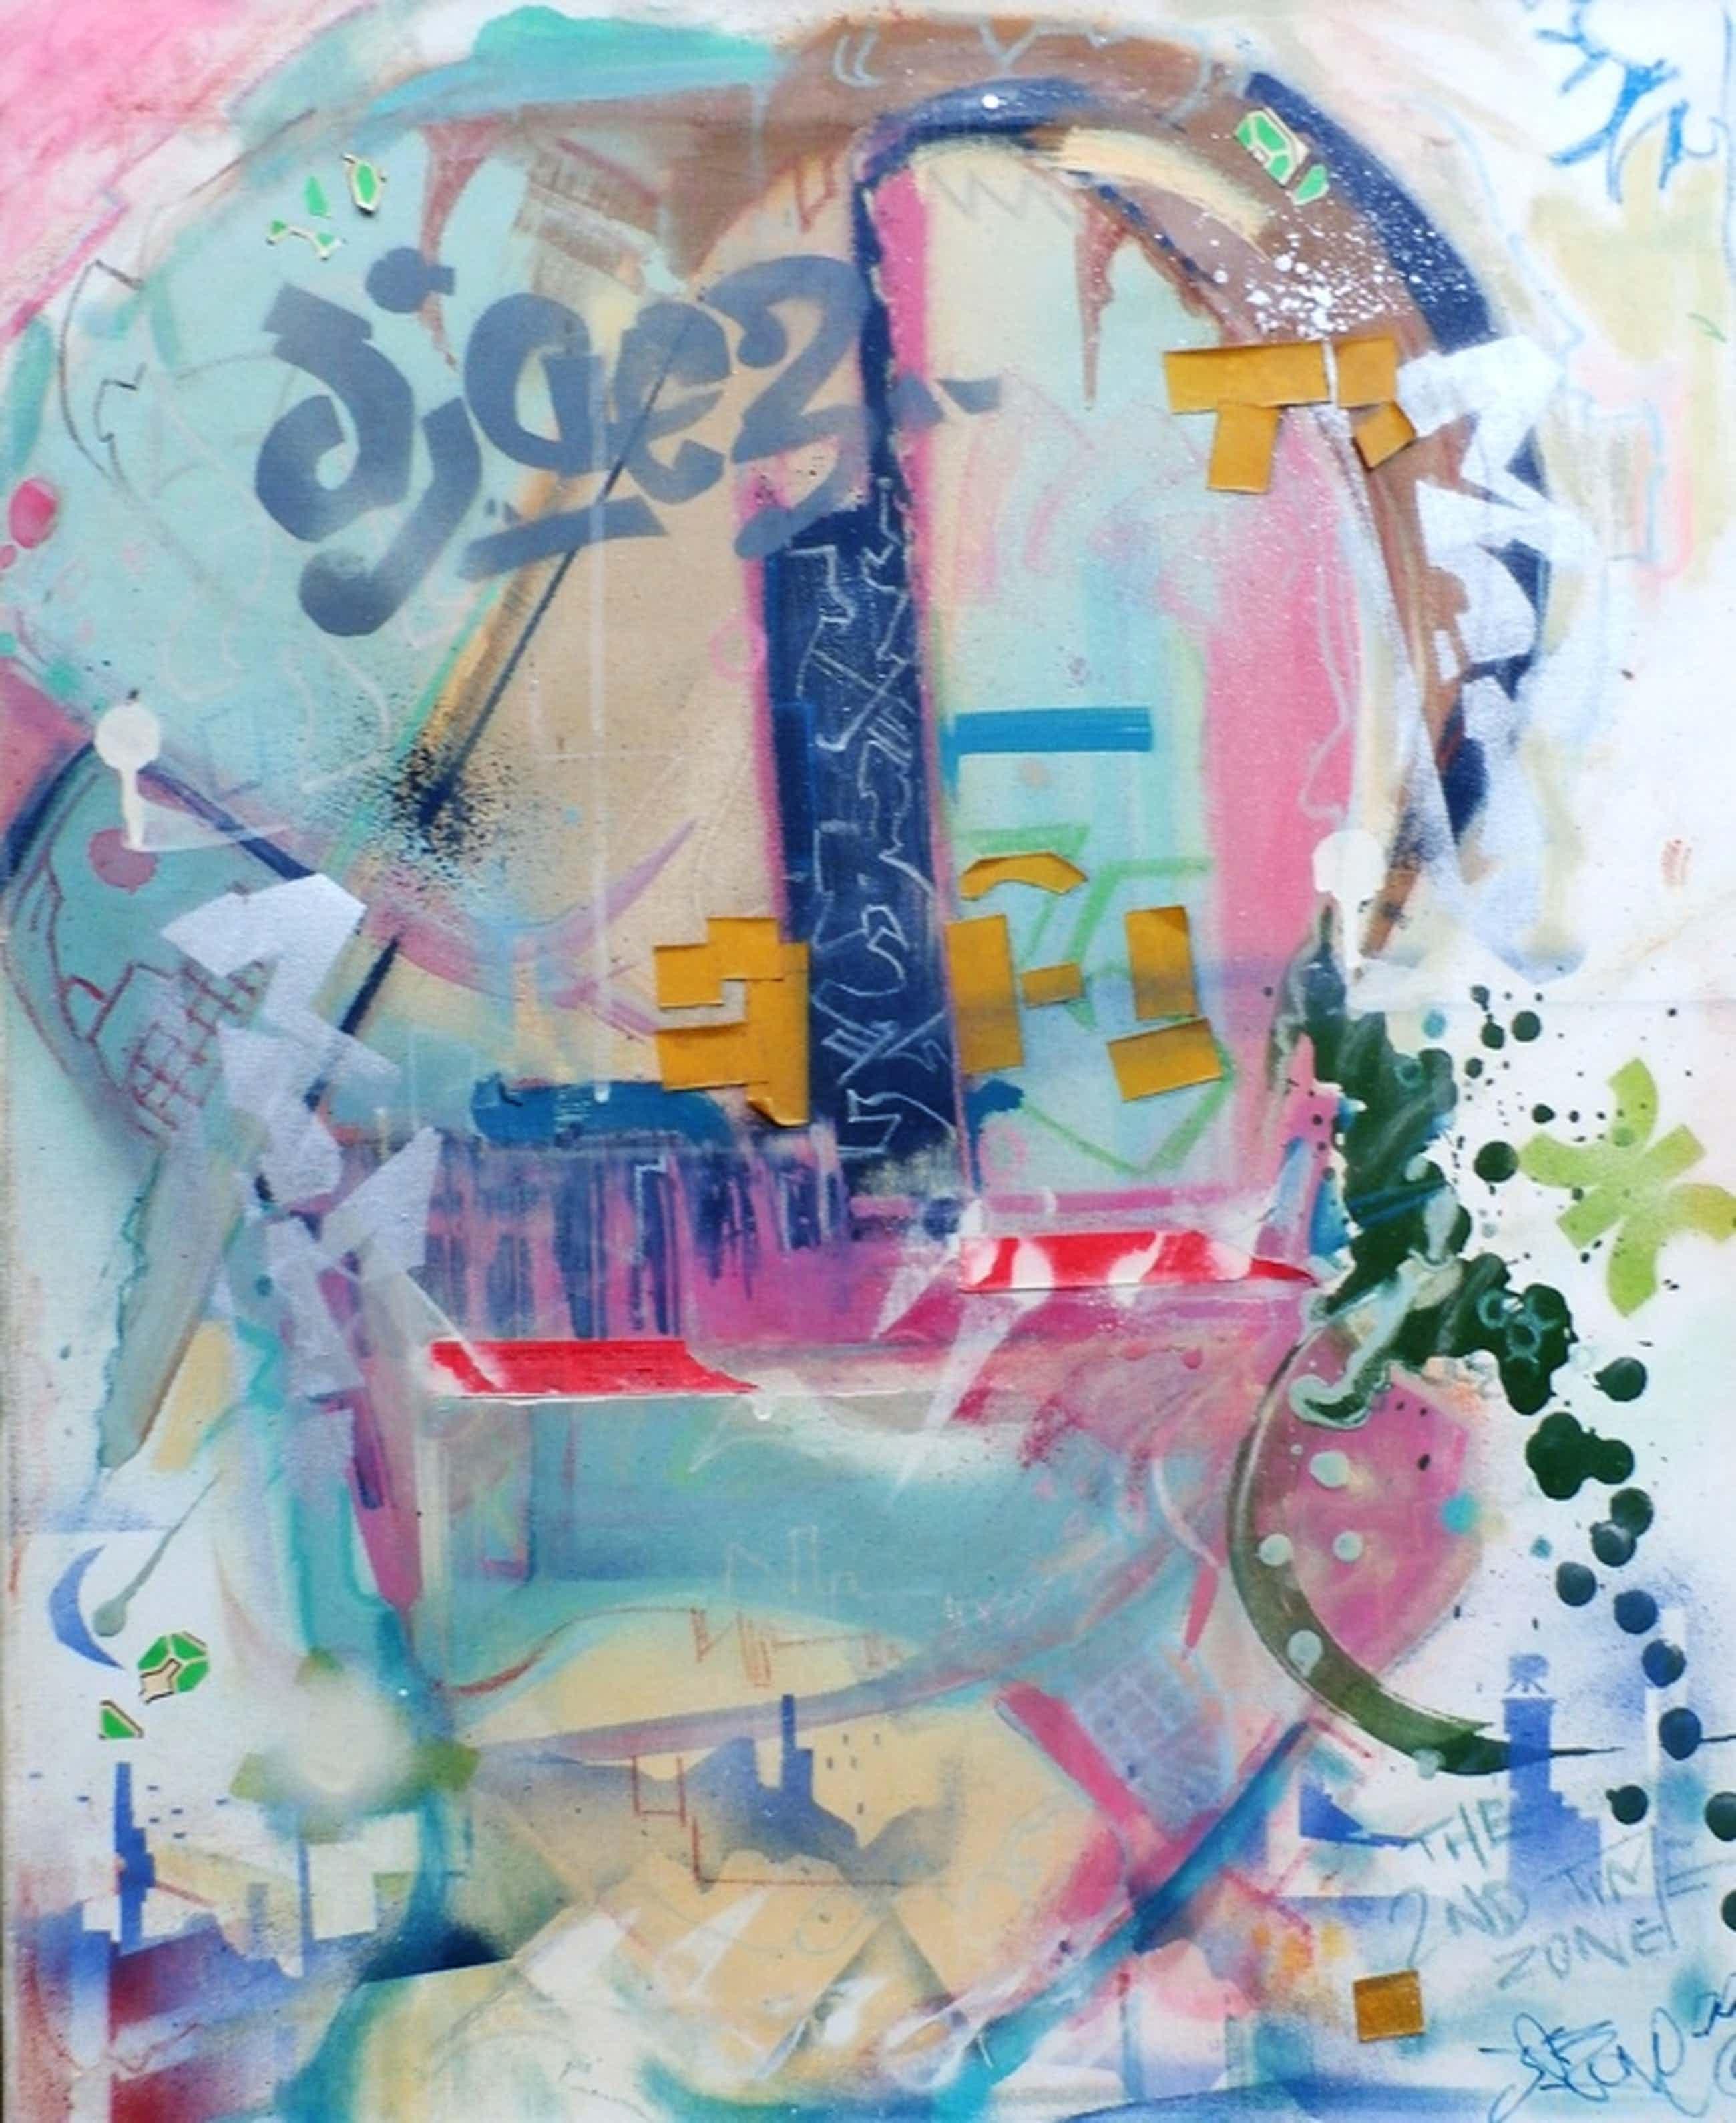 Jasper Krabbe - Collage/gemengde techniek op doek: The 2nd time zone - 1986 kopen? Bied vanaf 1100!